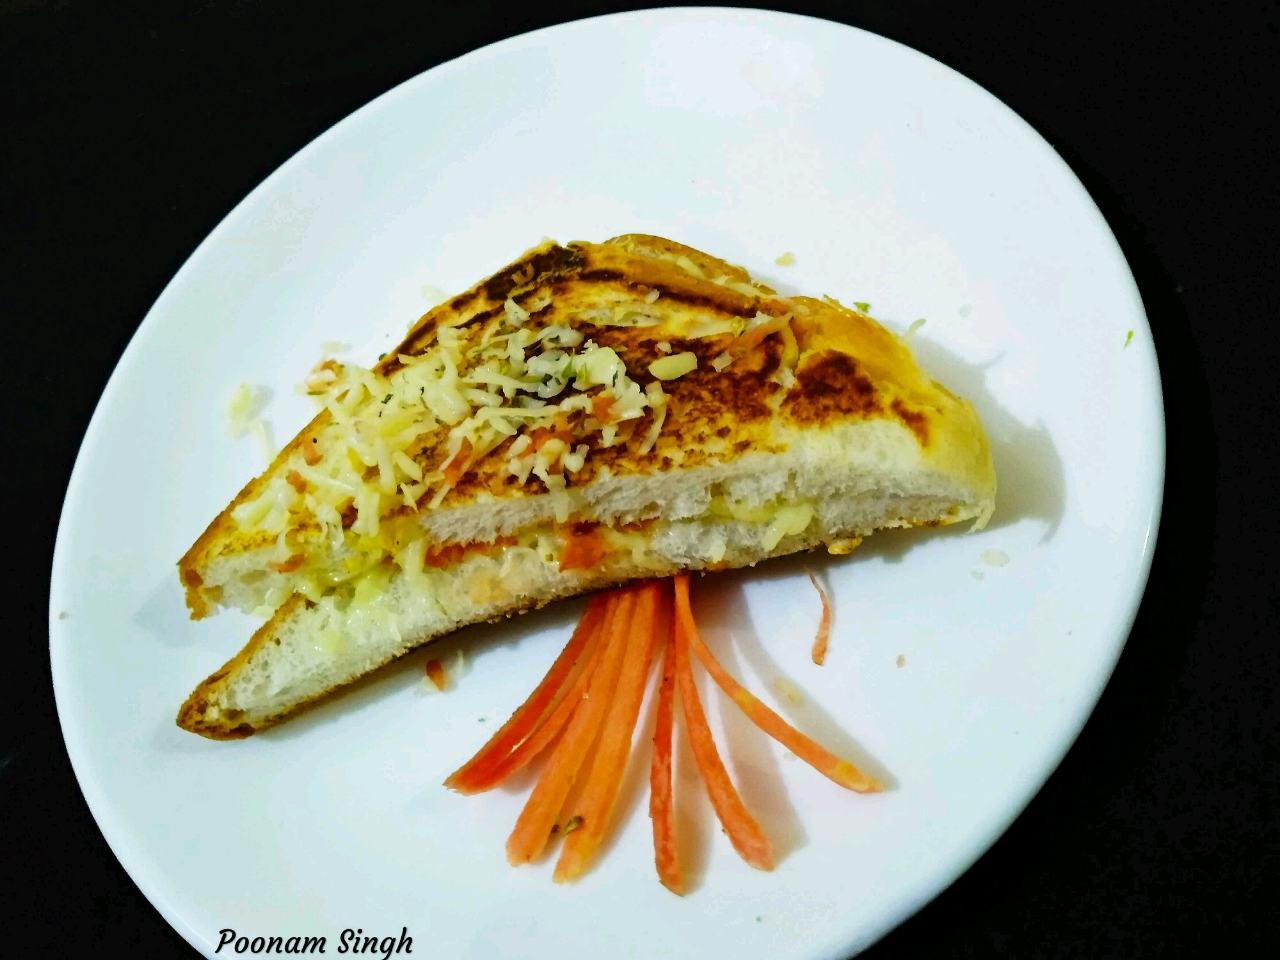 Cheese Carrot Sandwich